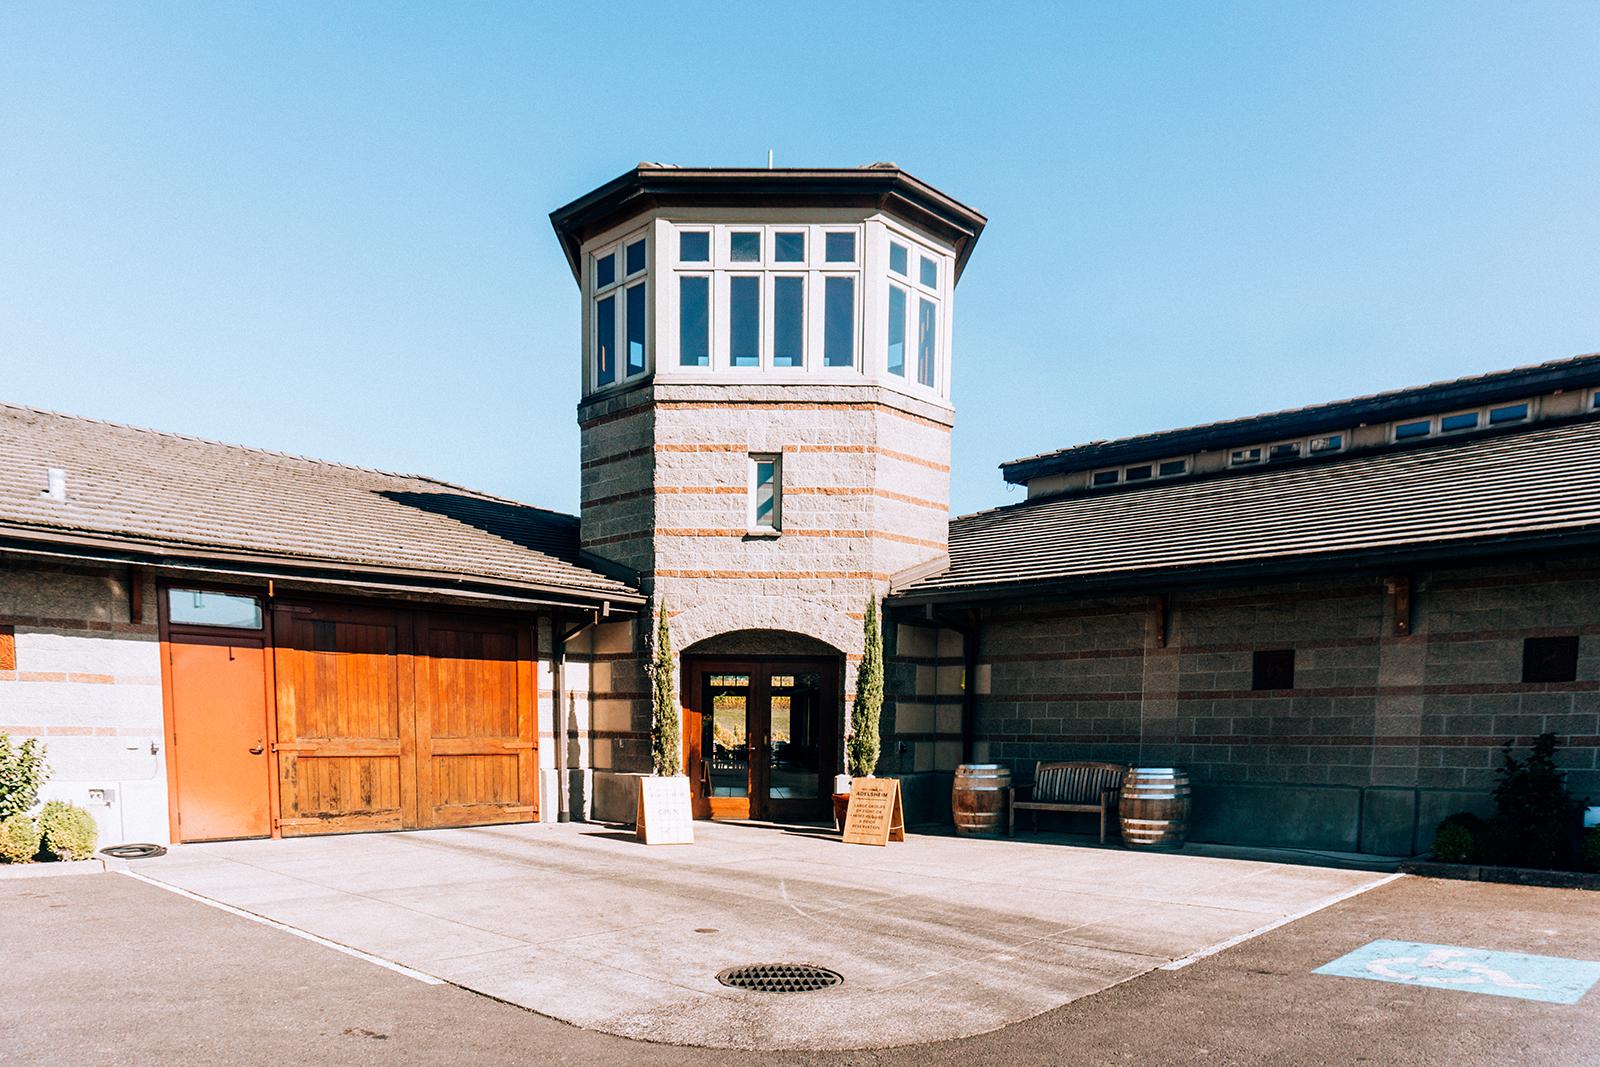 Adelsheim Vineyard entrance